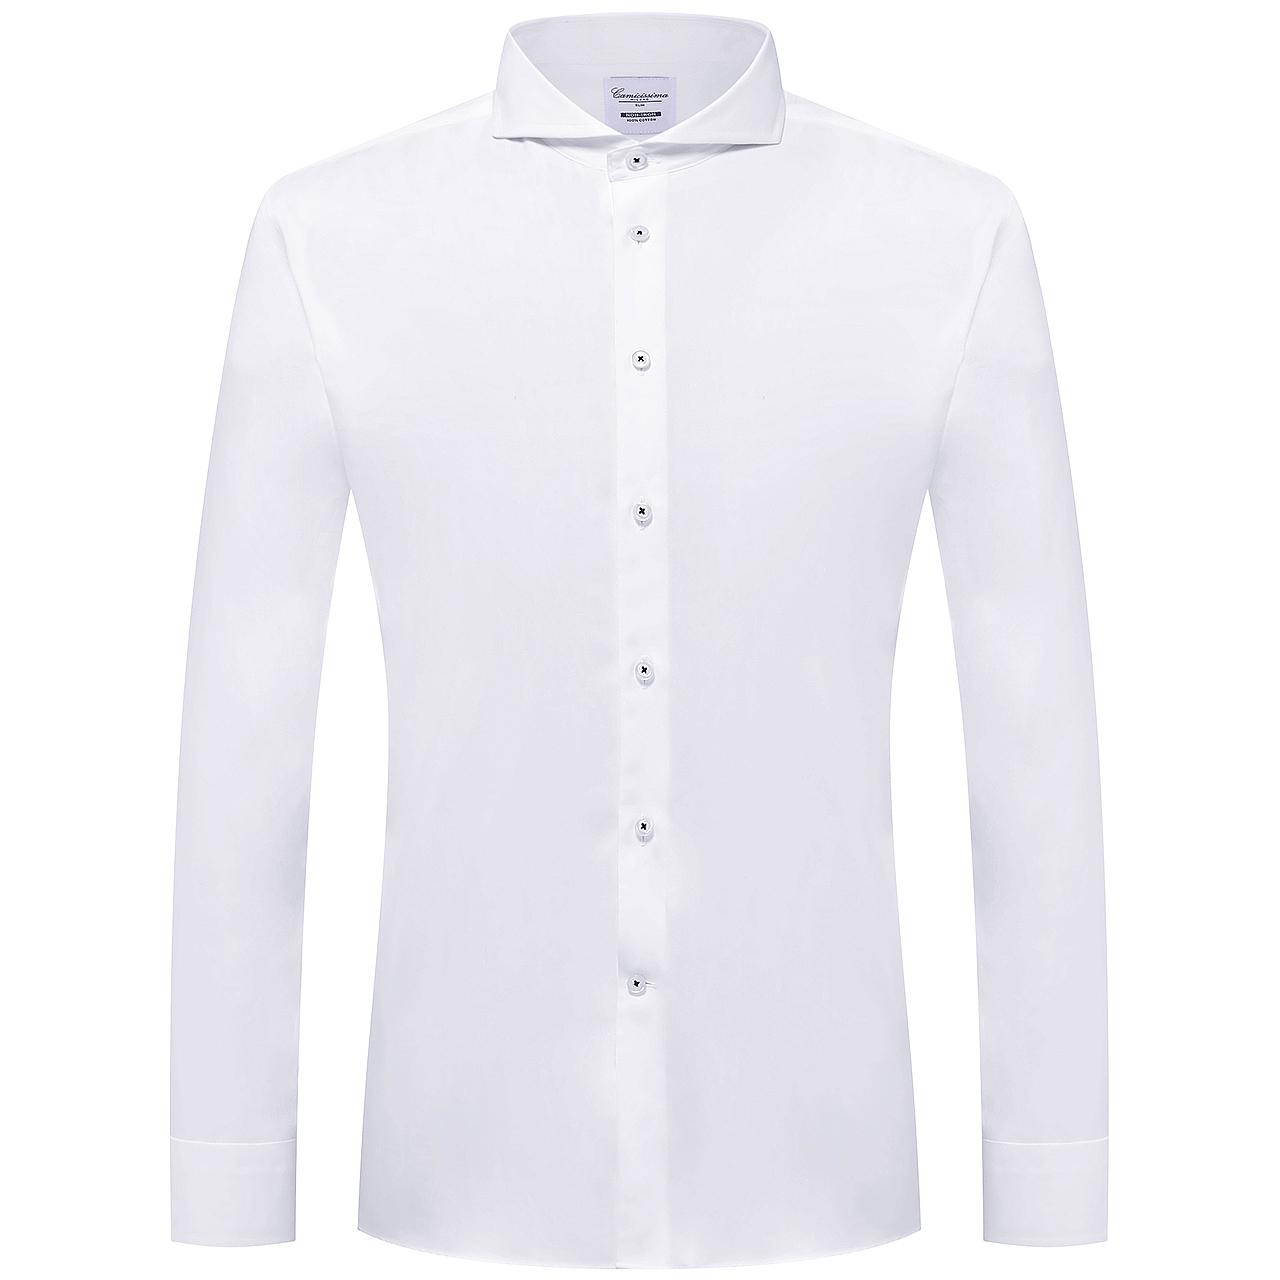 CAMICISSIMA/恺米切2017新款温莎领免烫长袖衬衫 商务男白色衬衣